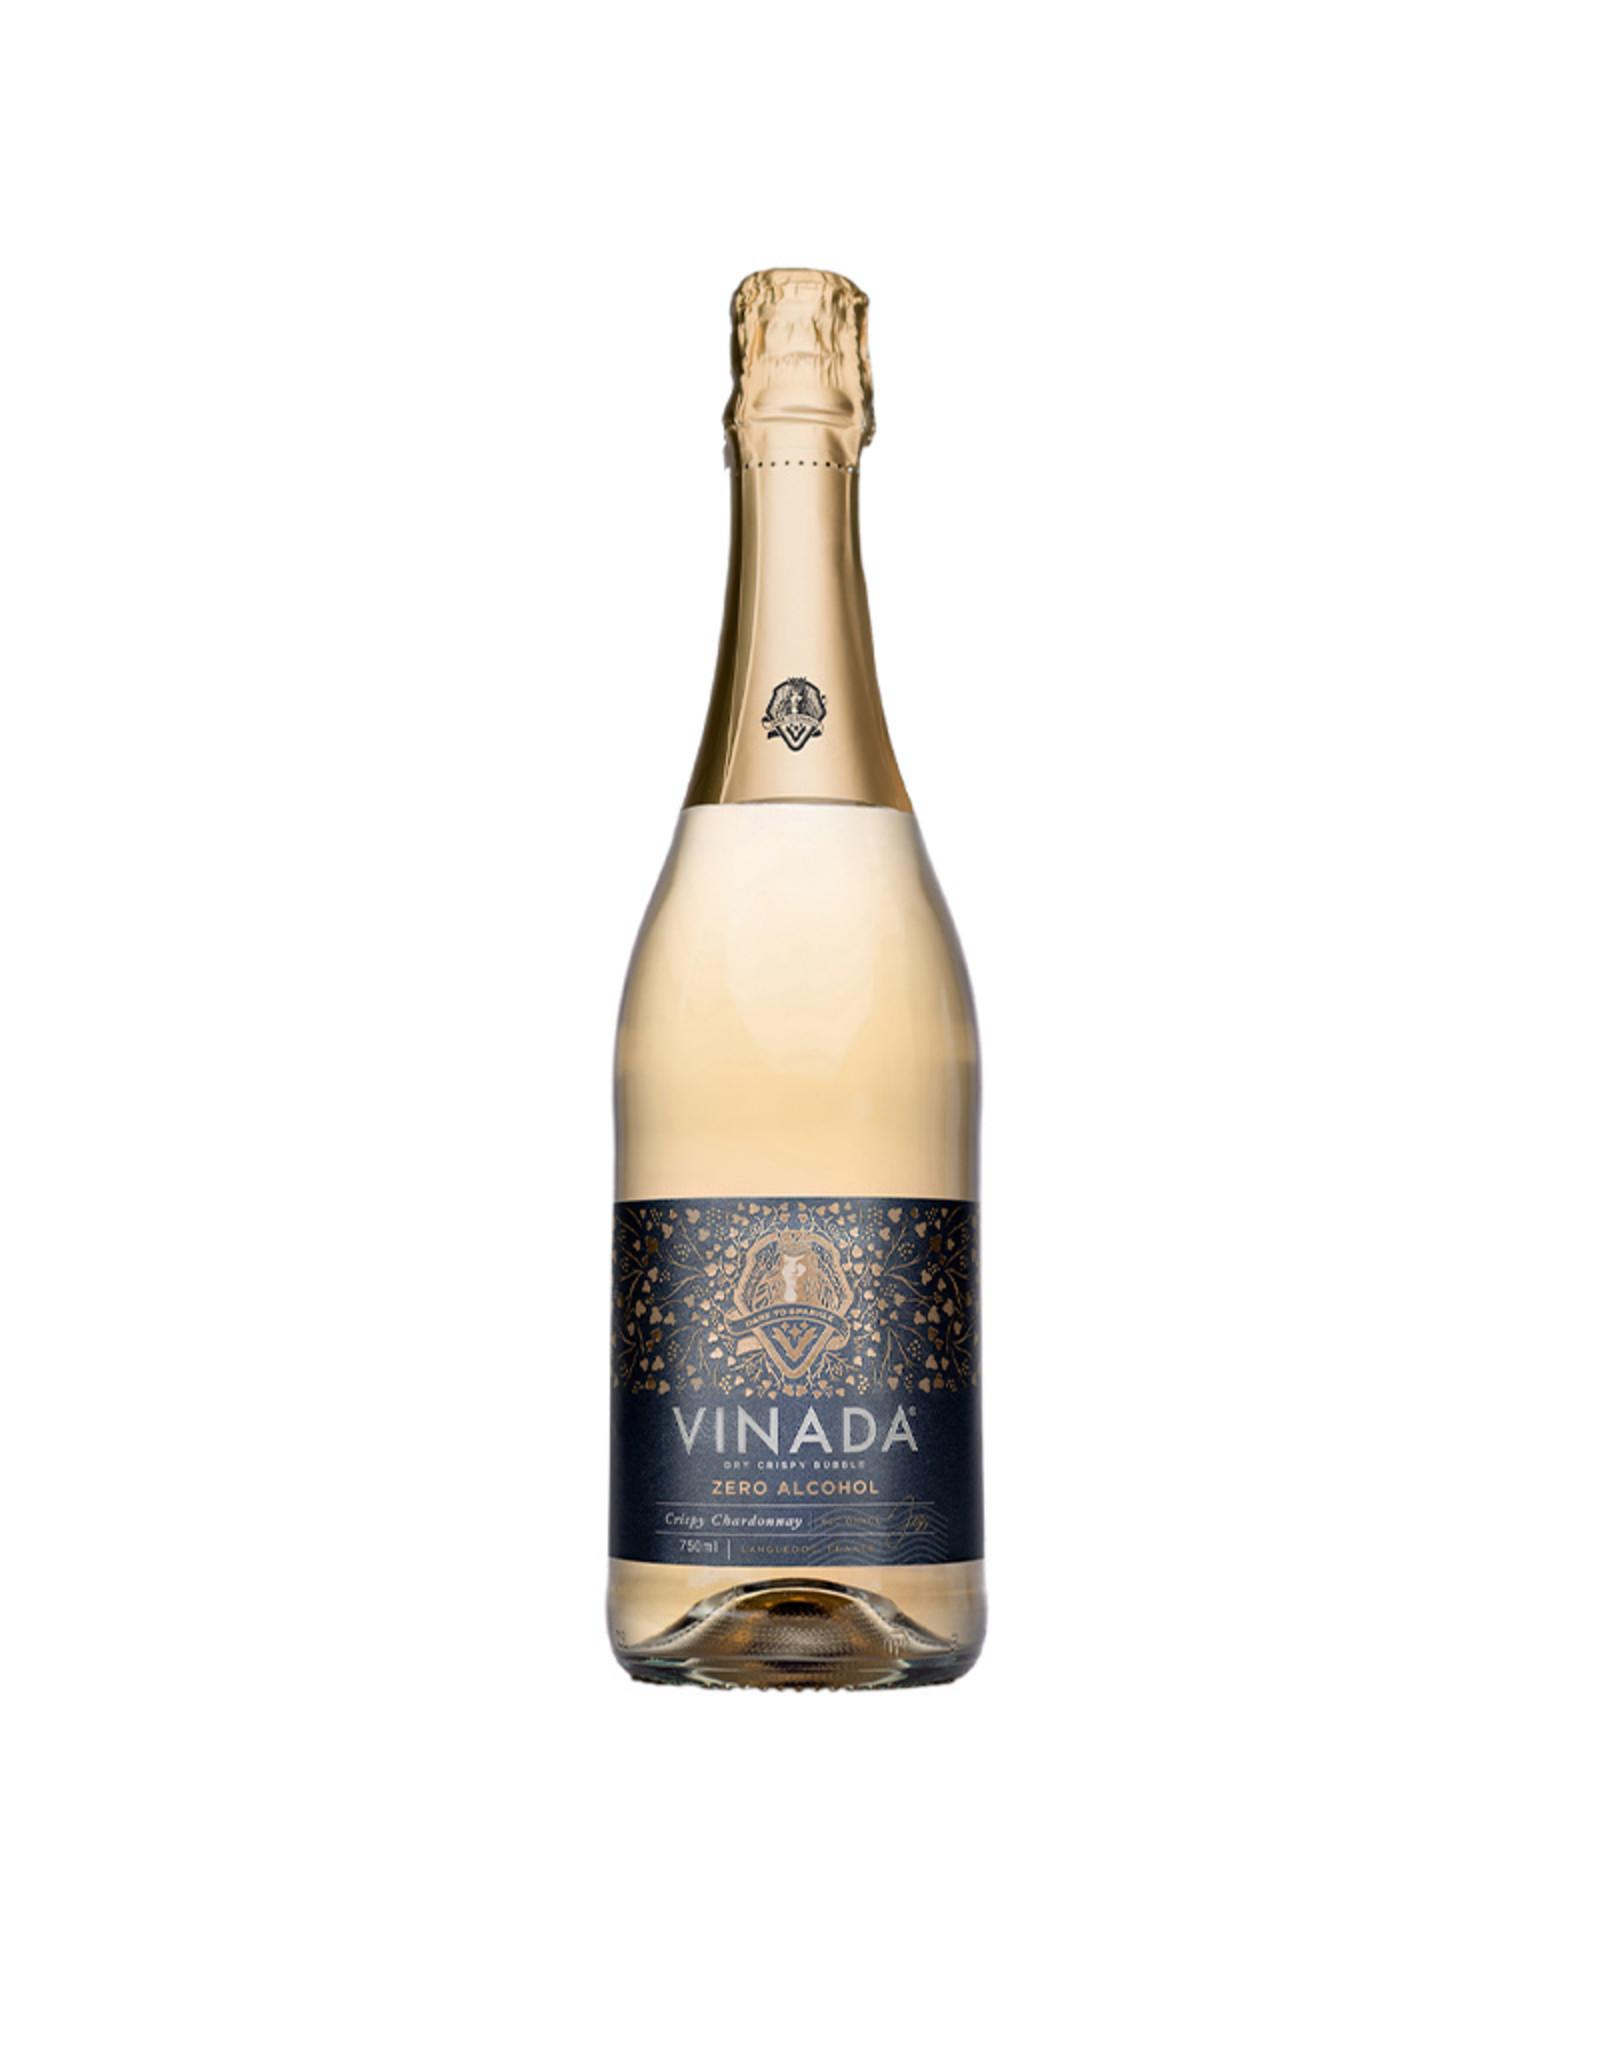 Vinada Vinada  - Crispy Chardonnay